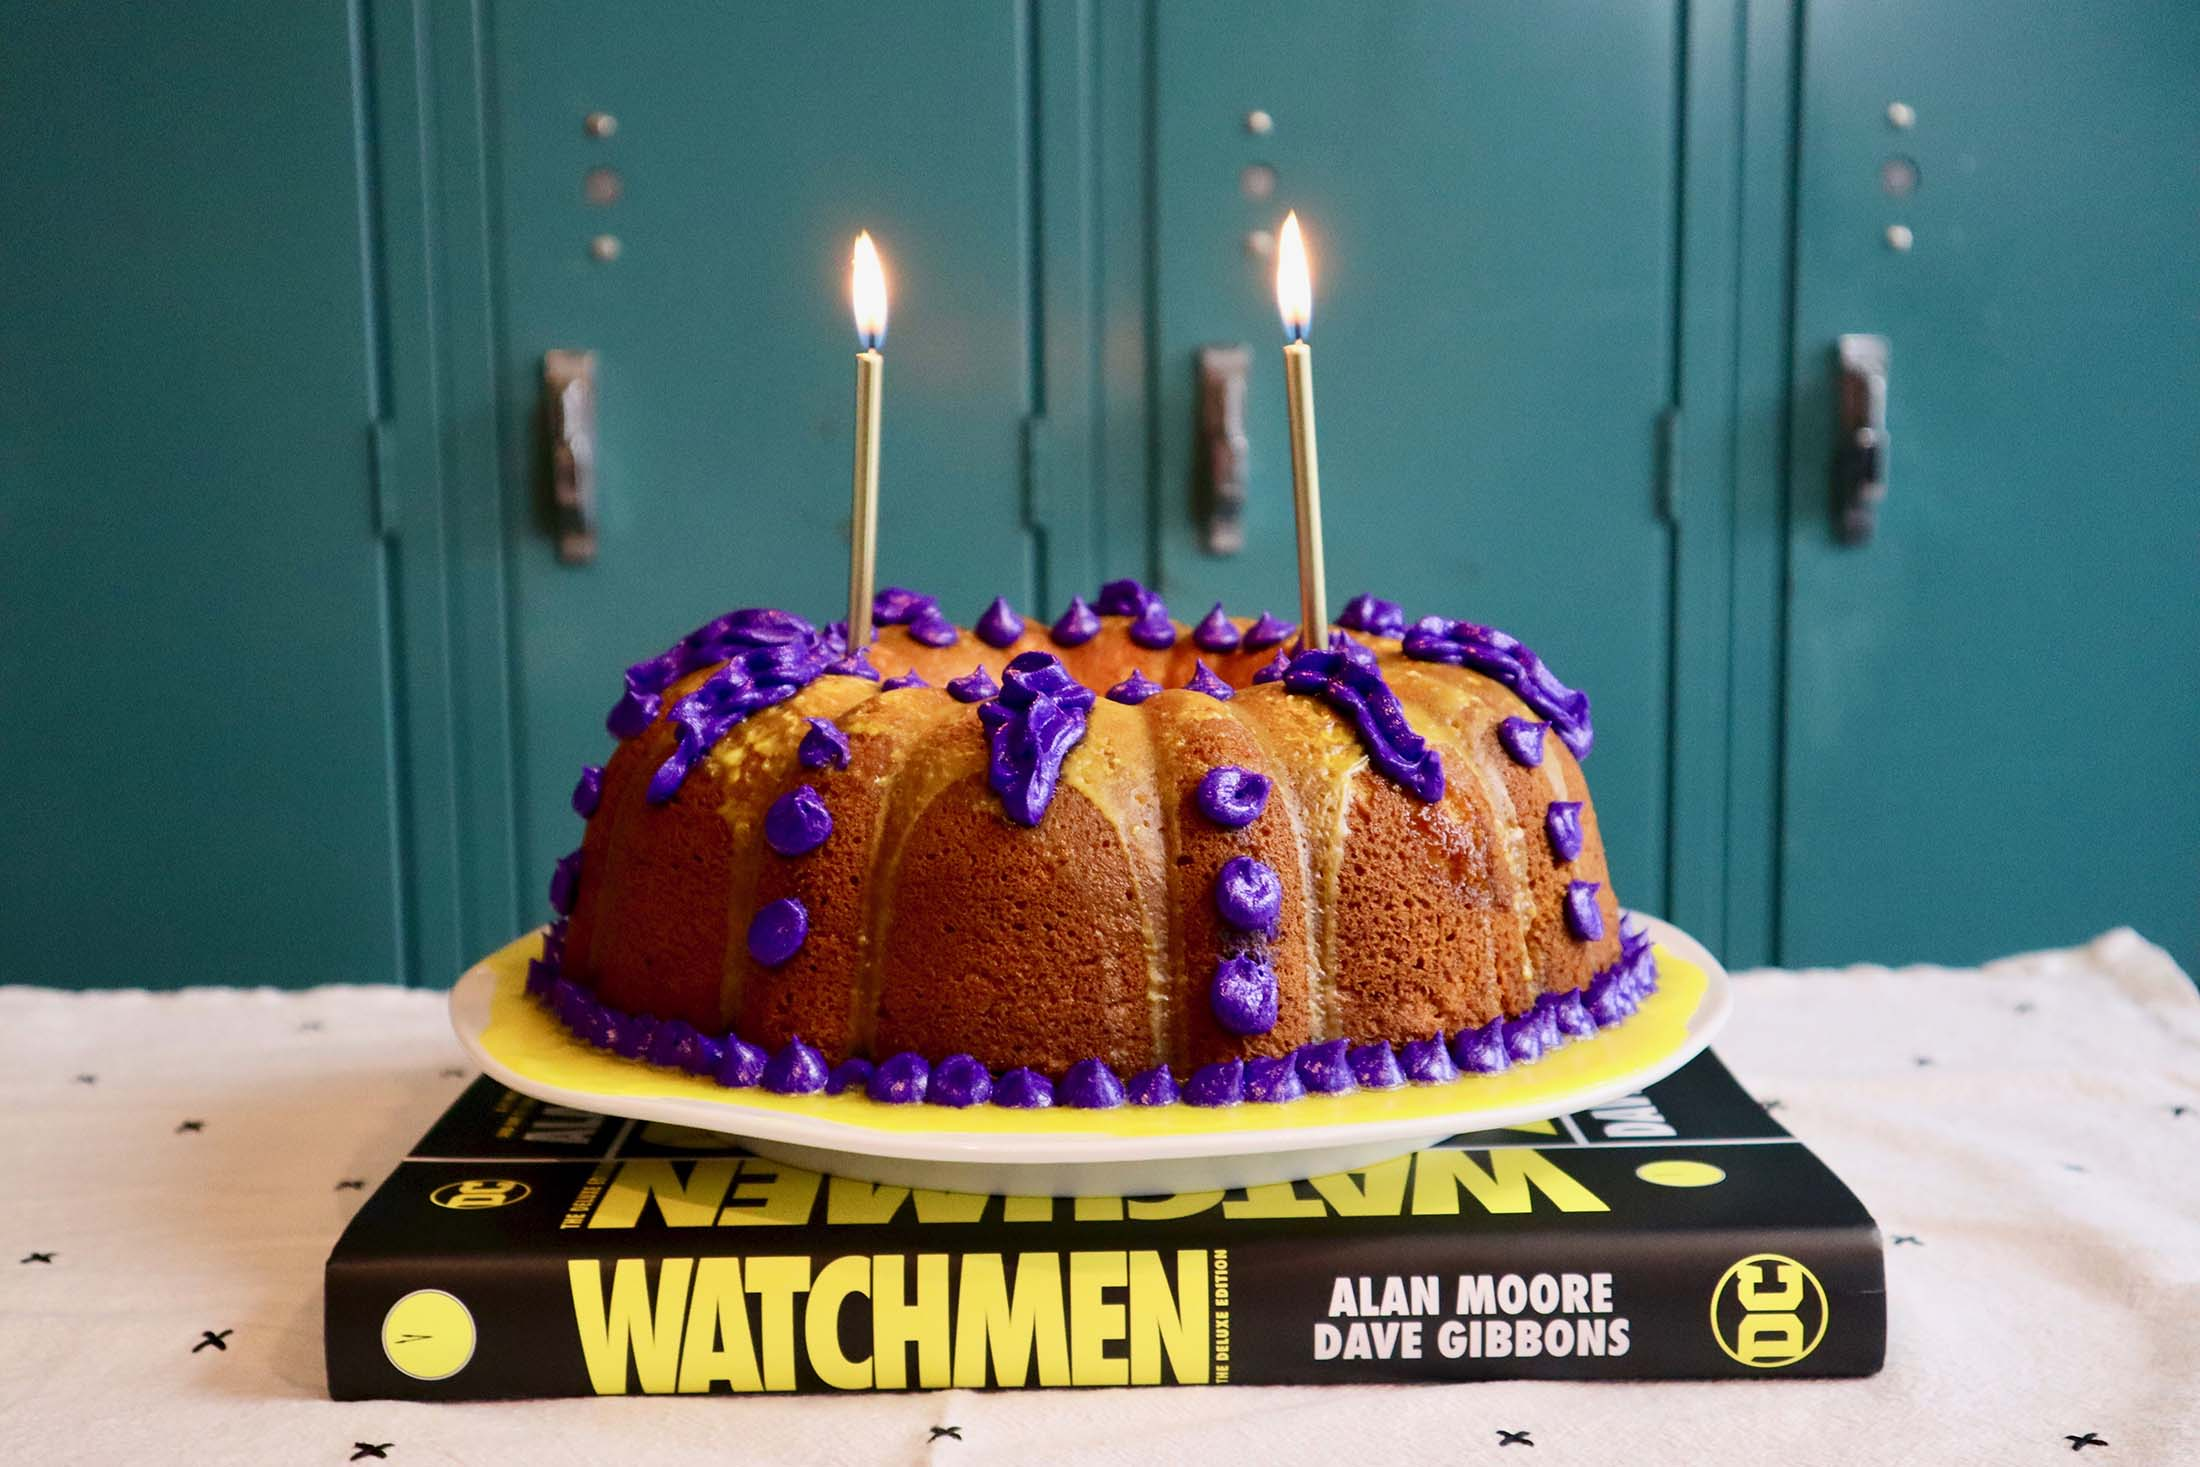 Awe Inspiring Adrian Veidts Birthday Cake From Hbos The Watchmen Popcorner Personalised Birthday Cards Paralily Jamesorg